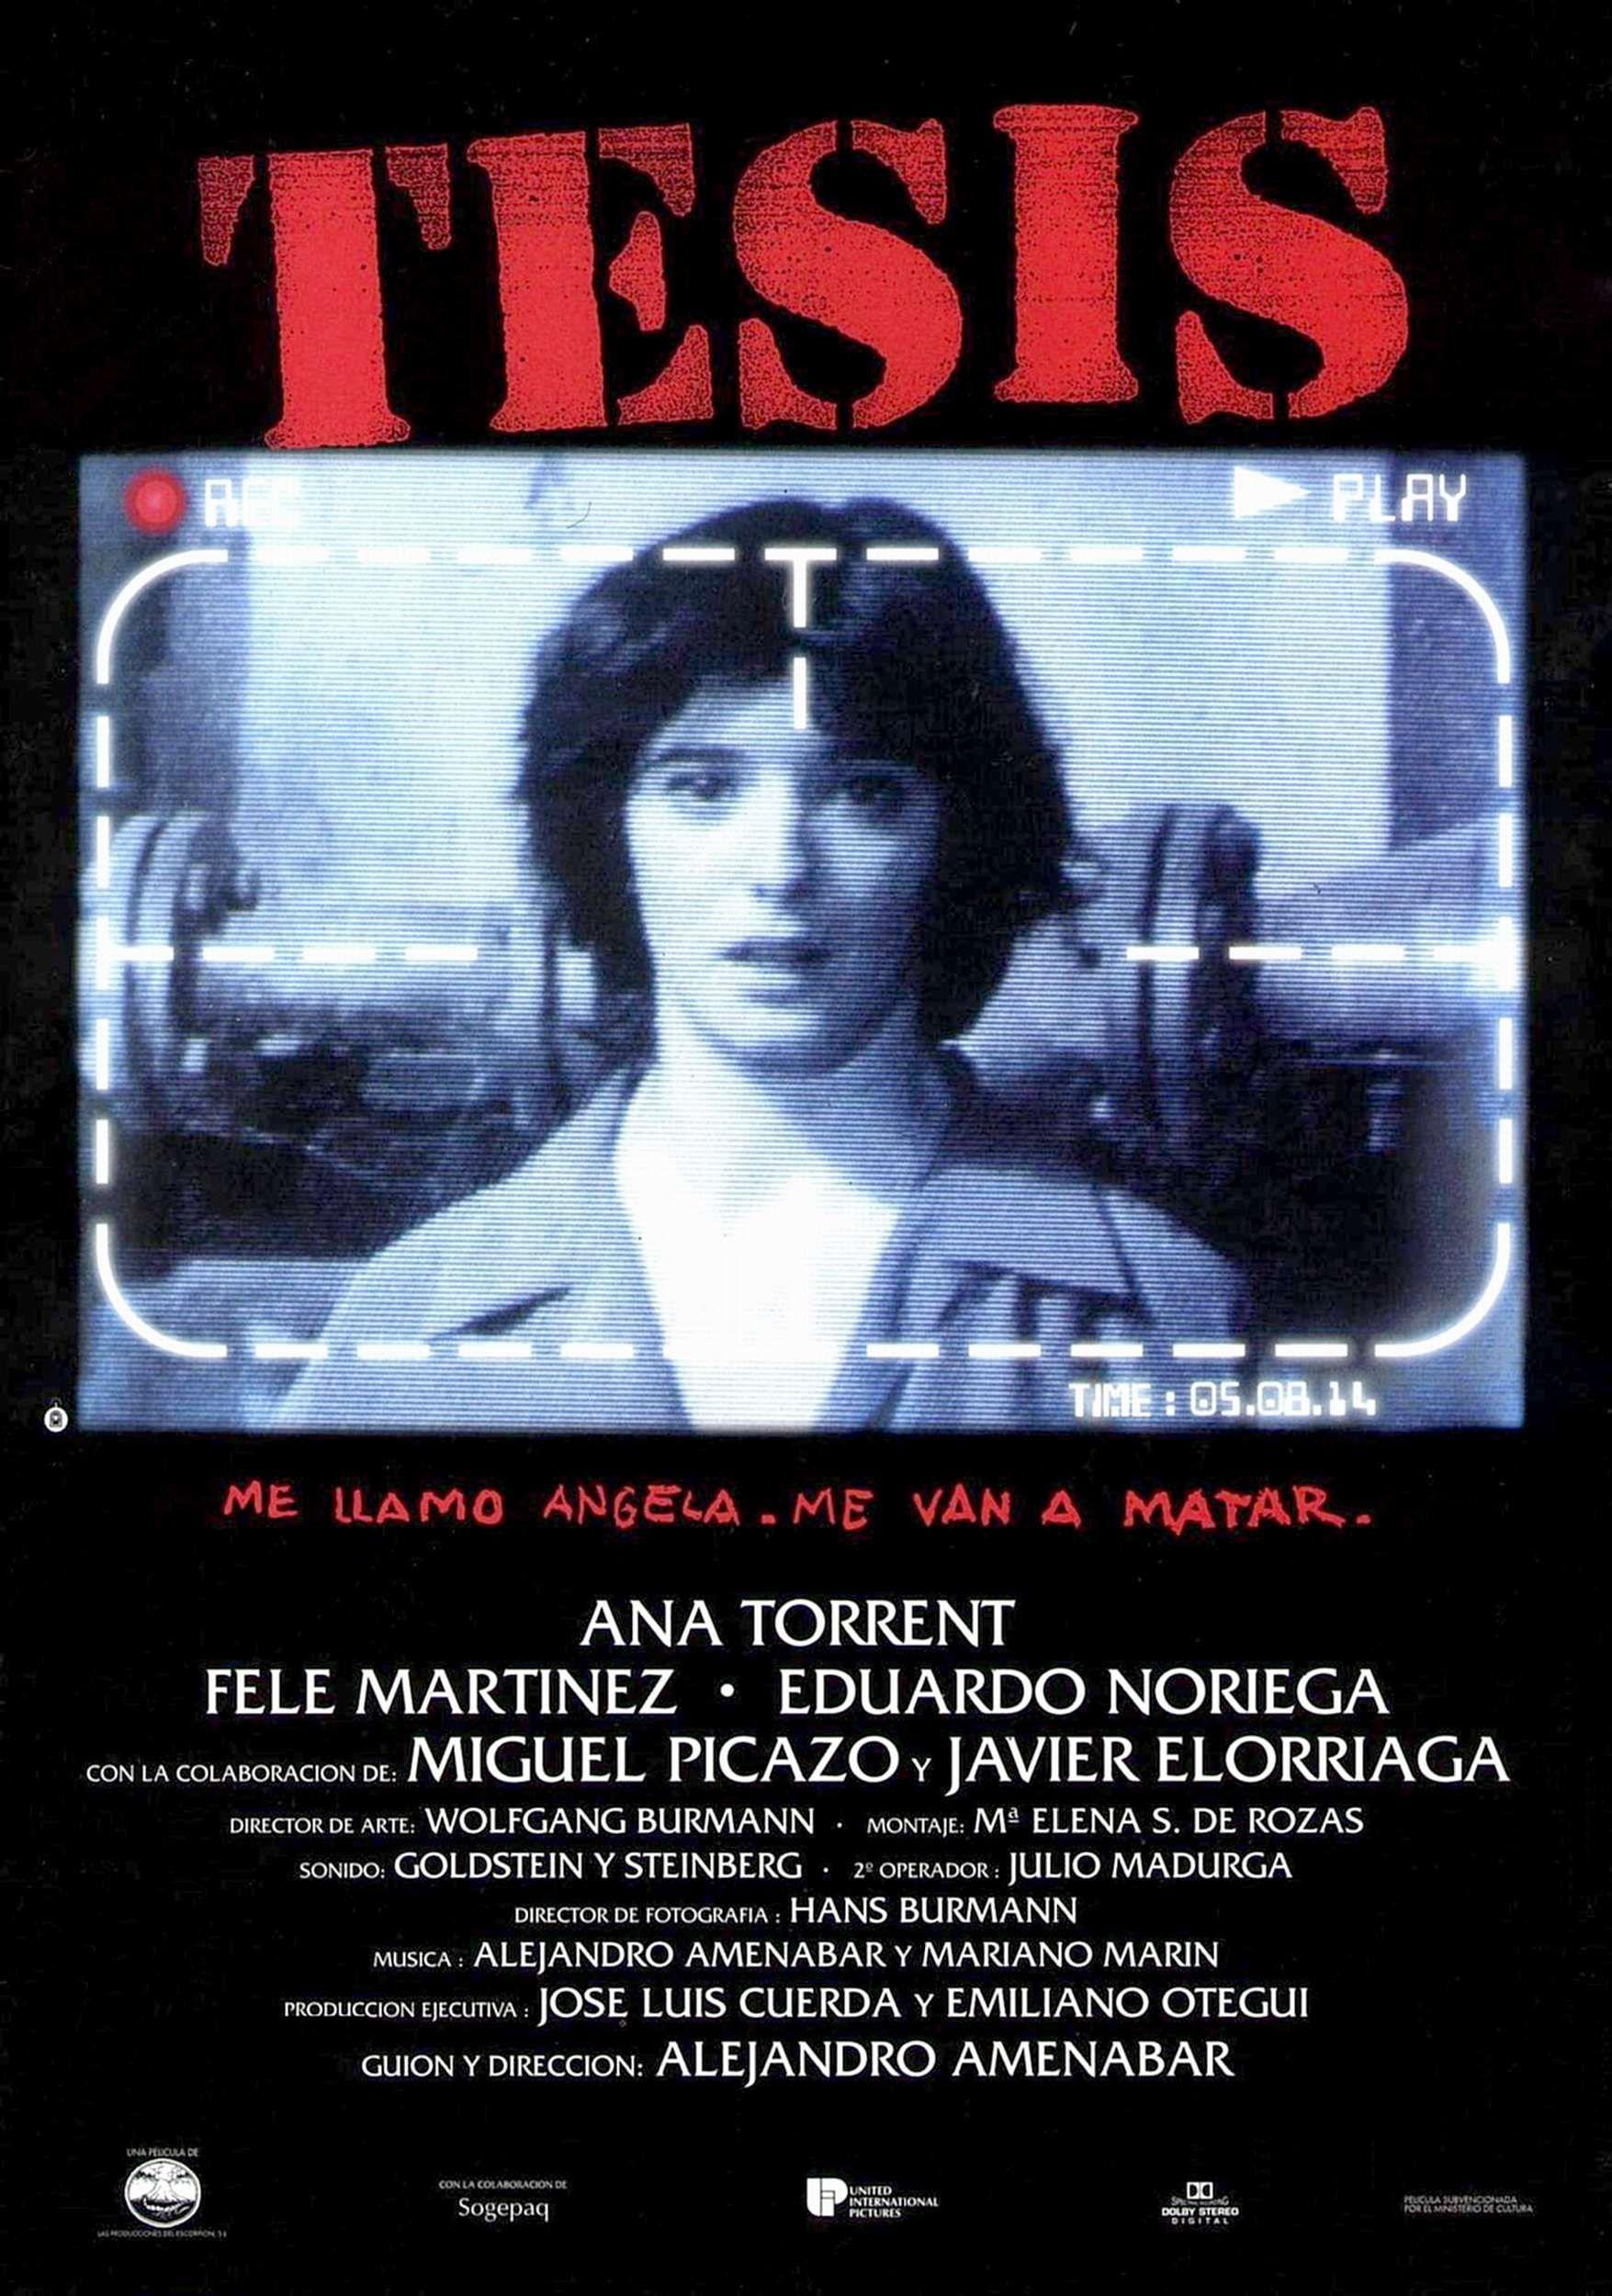 thesis amenabar Tesis, igrani, triler, španjolska, 1996 režija: alejandro amenábar teza  uloge: ana torrent (ángela), fele martínez (chema), eduardo noriega (bosco .